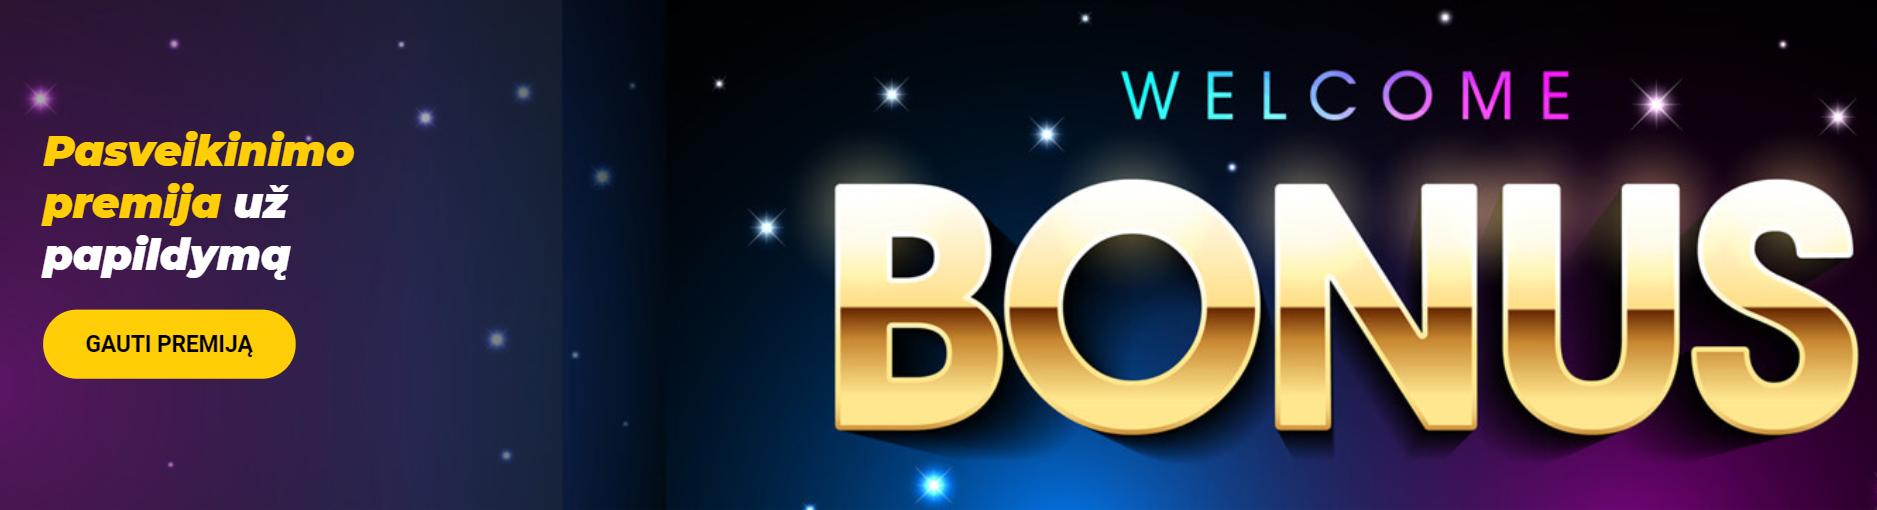 betwinner casino bonus no deposit bonus welcome bonus kazino premija 300€